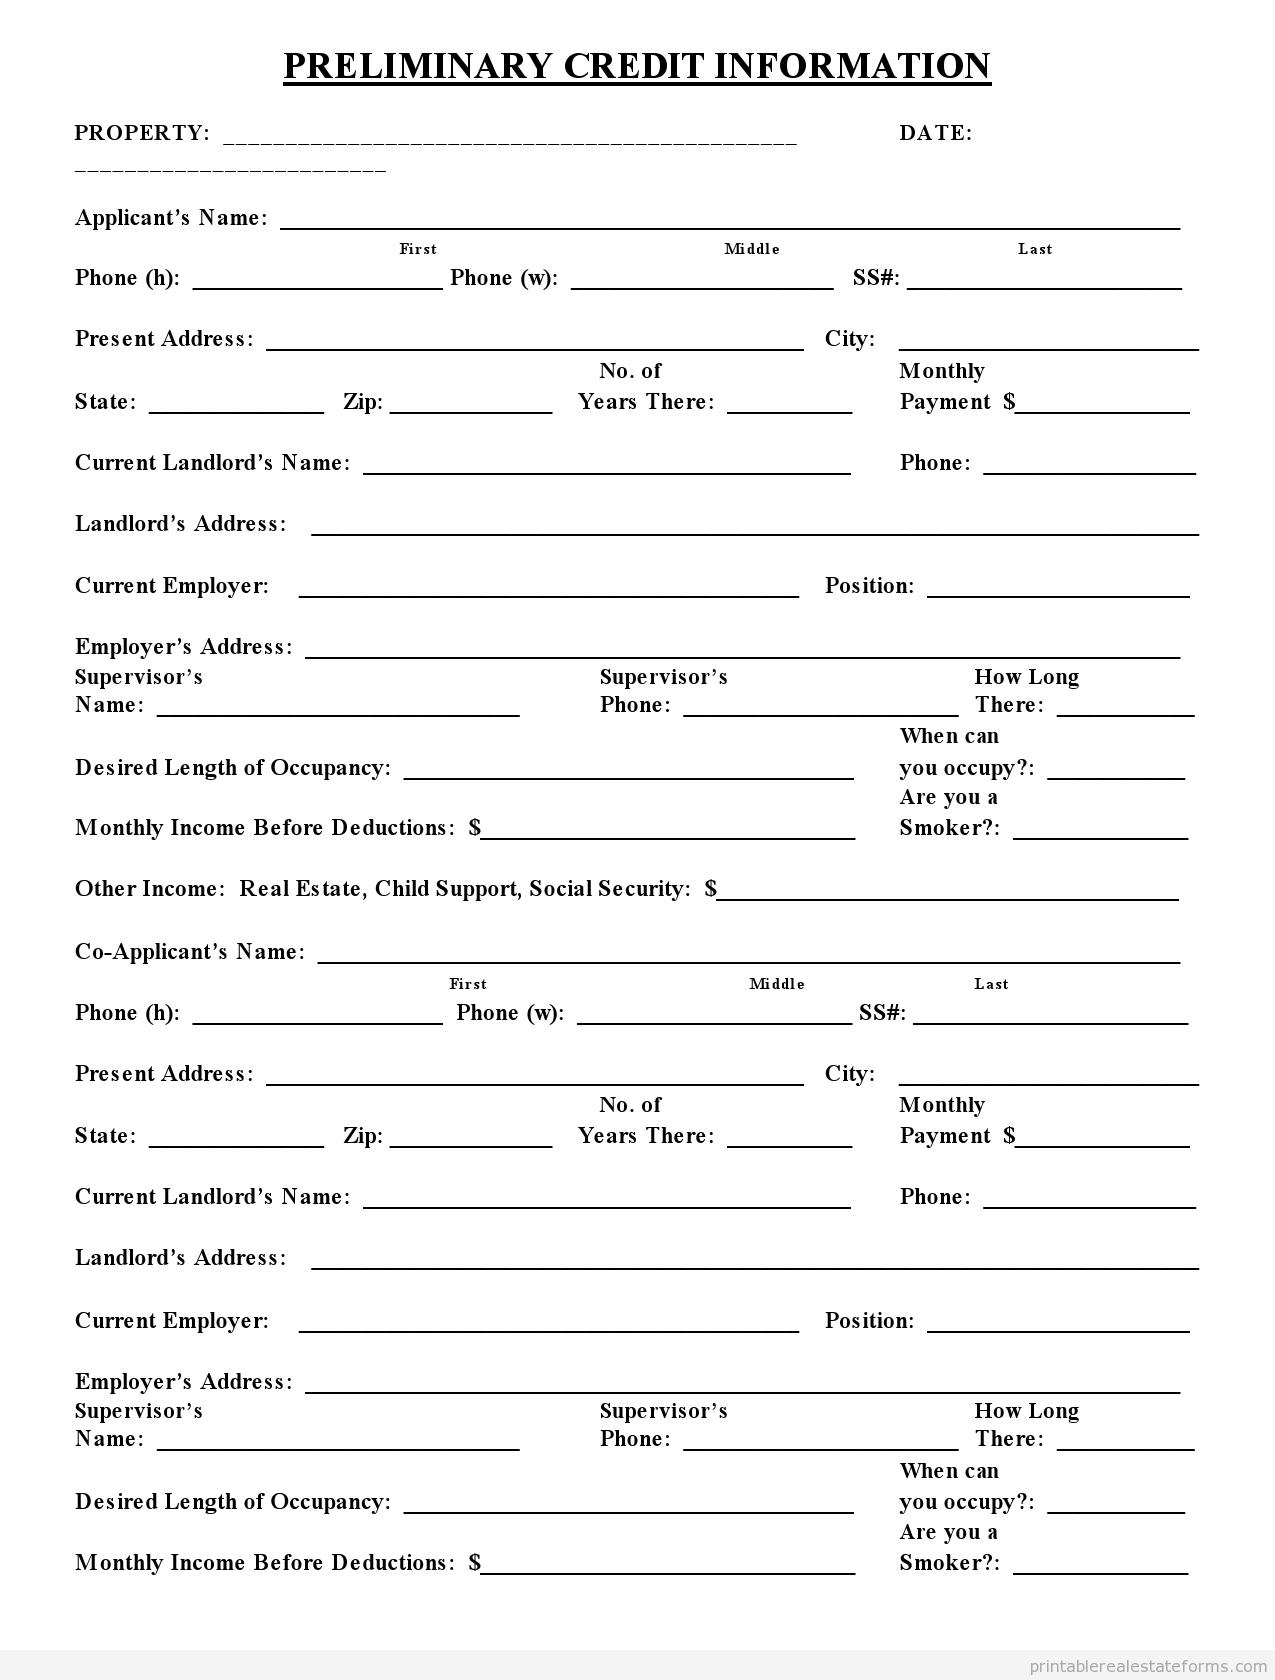 Sample Printable Preliminary Credit Application Form